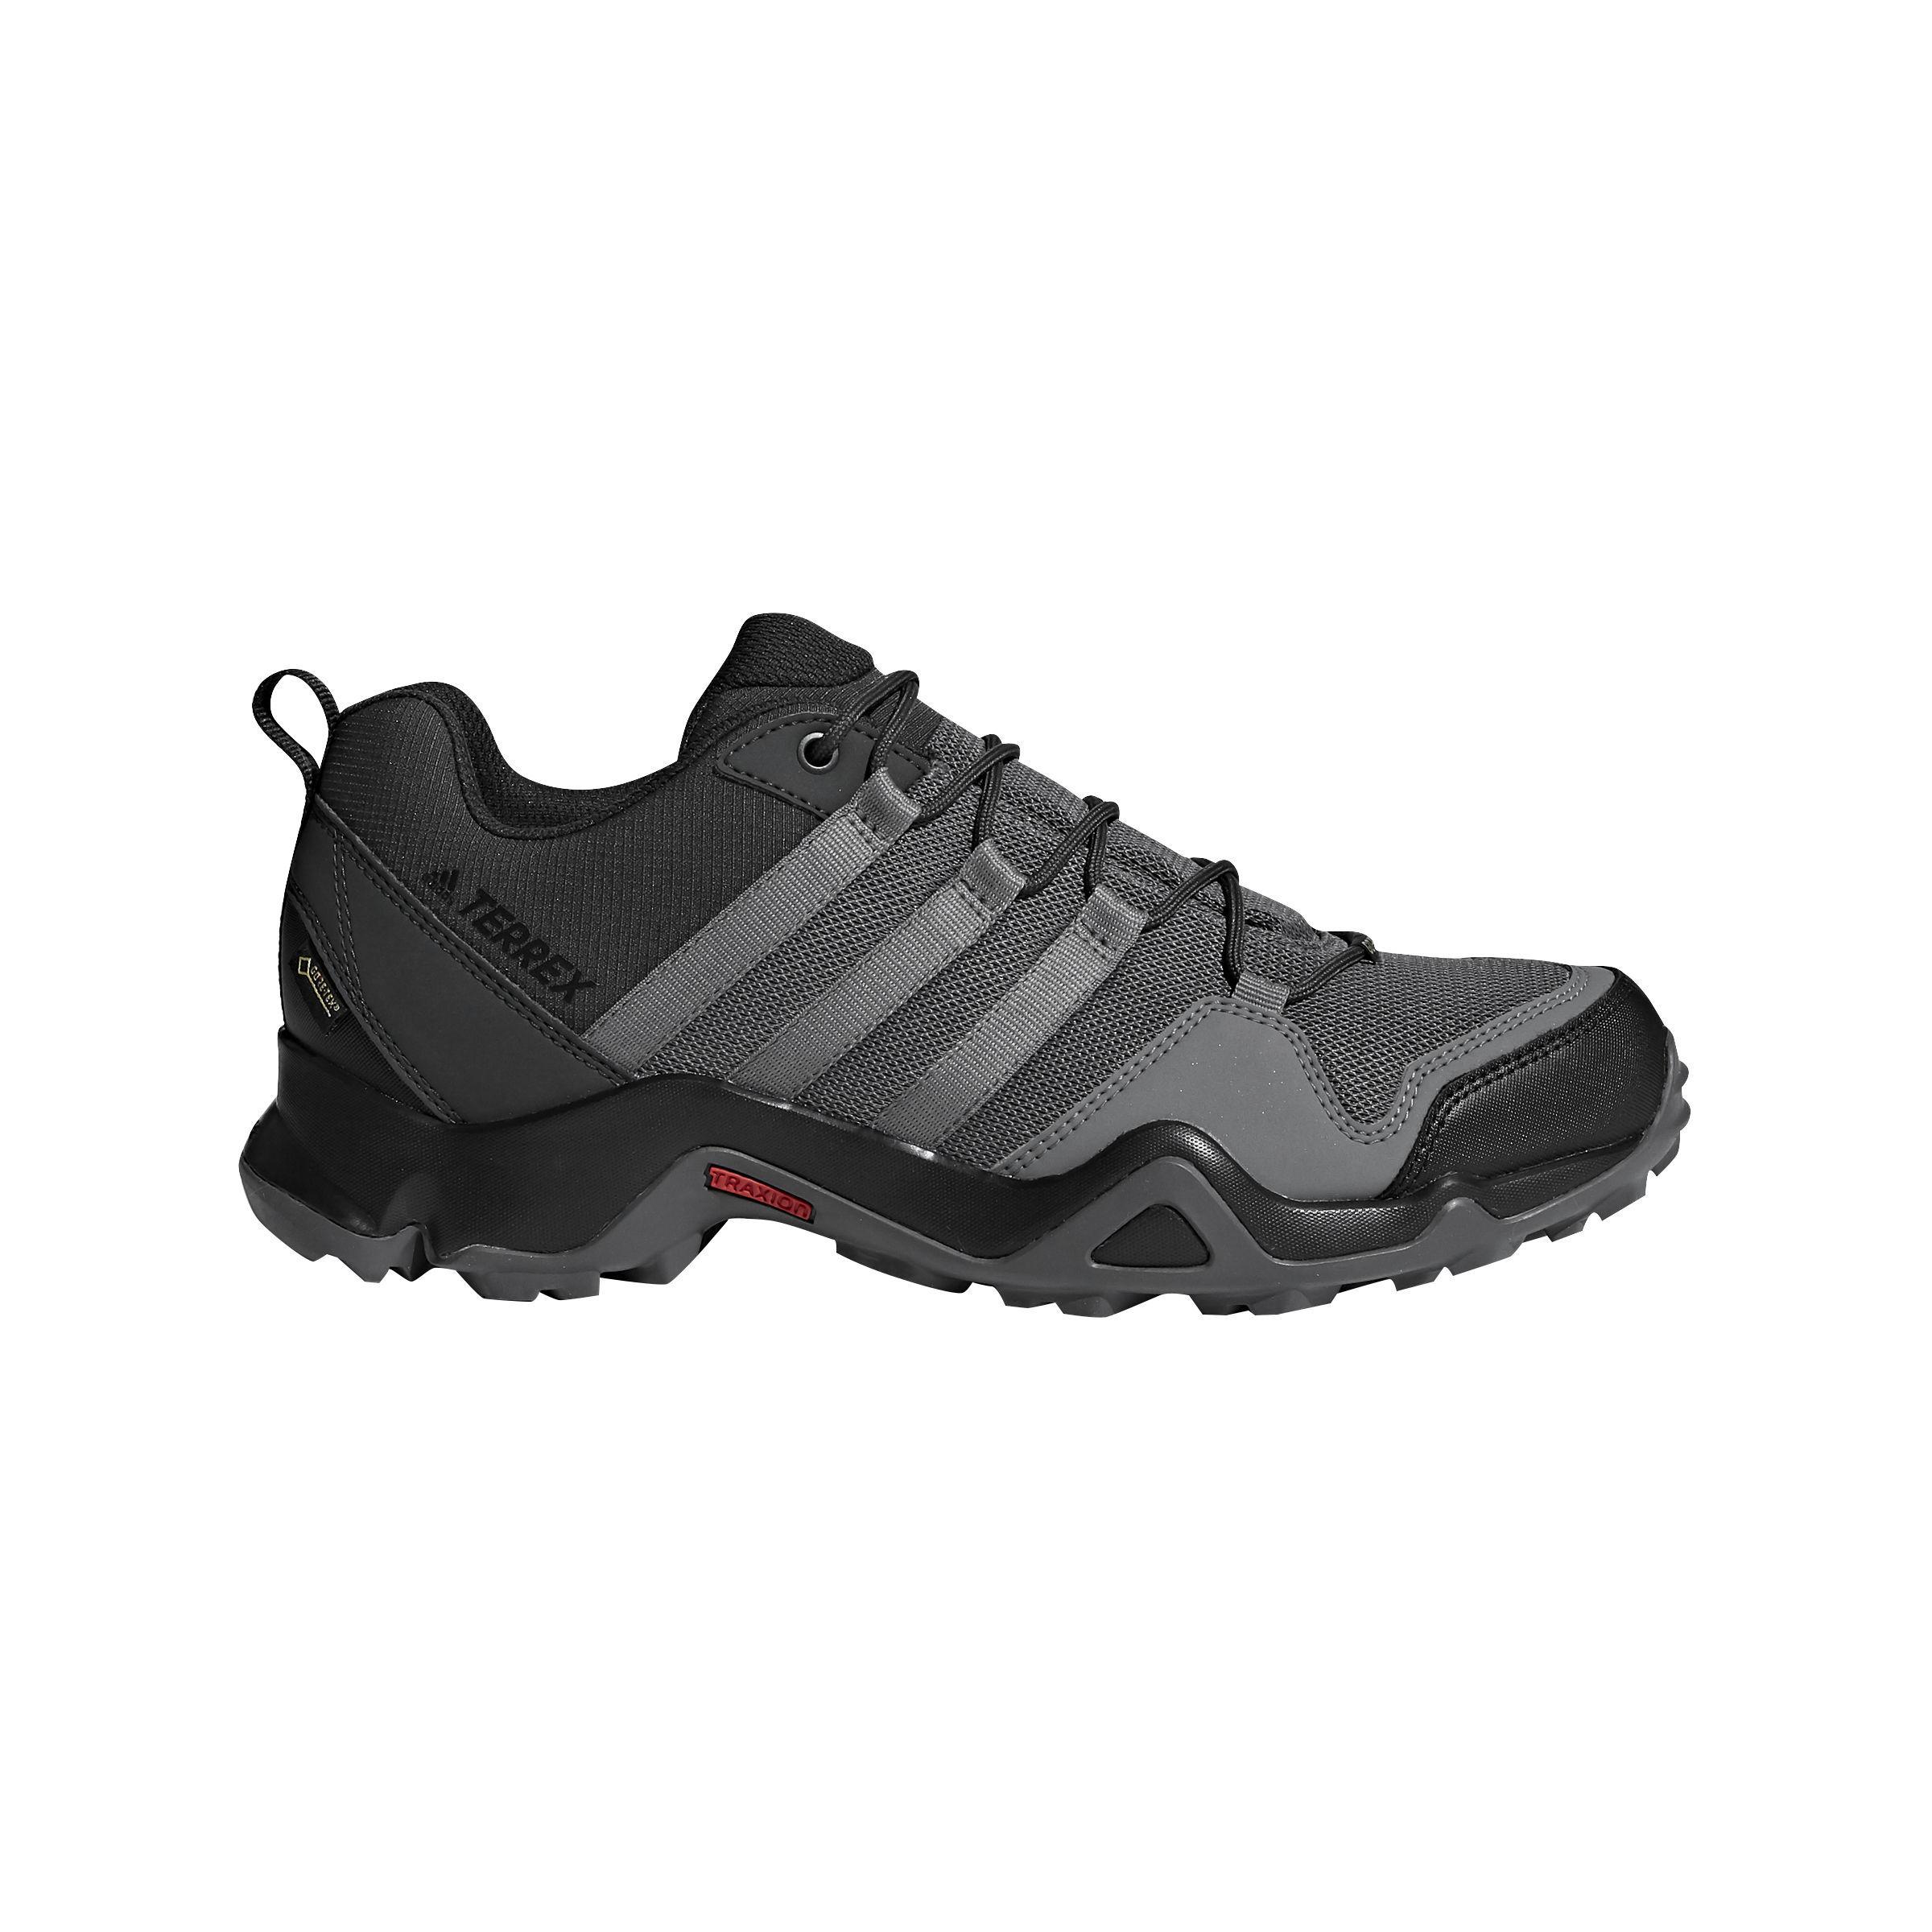 bfced175c0e8c Adidas Outdoor Terrex Ax2R GTX Hiking Shoe - Men s CM7718-13